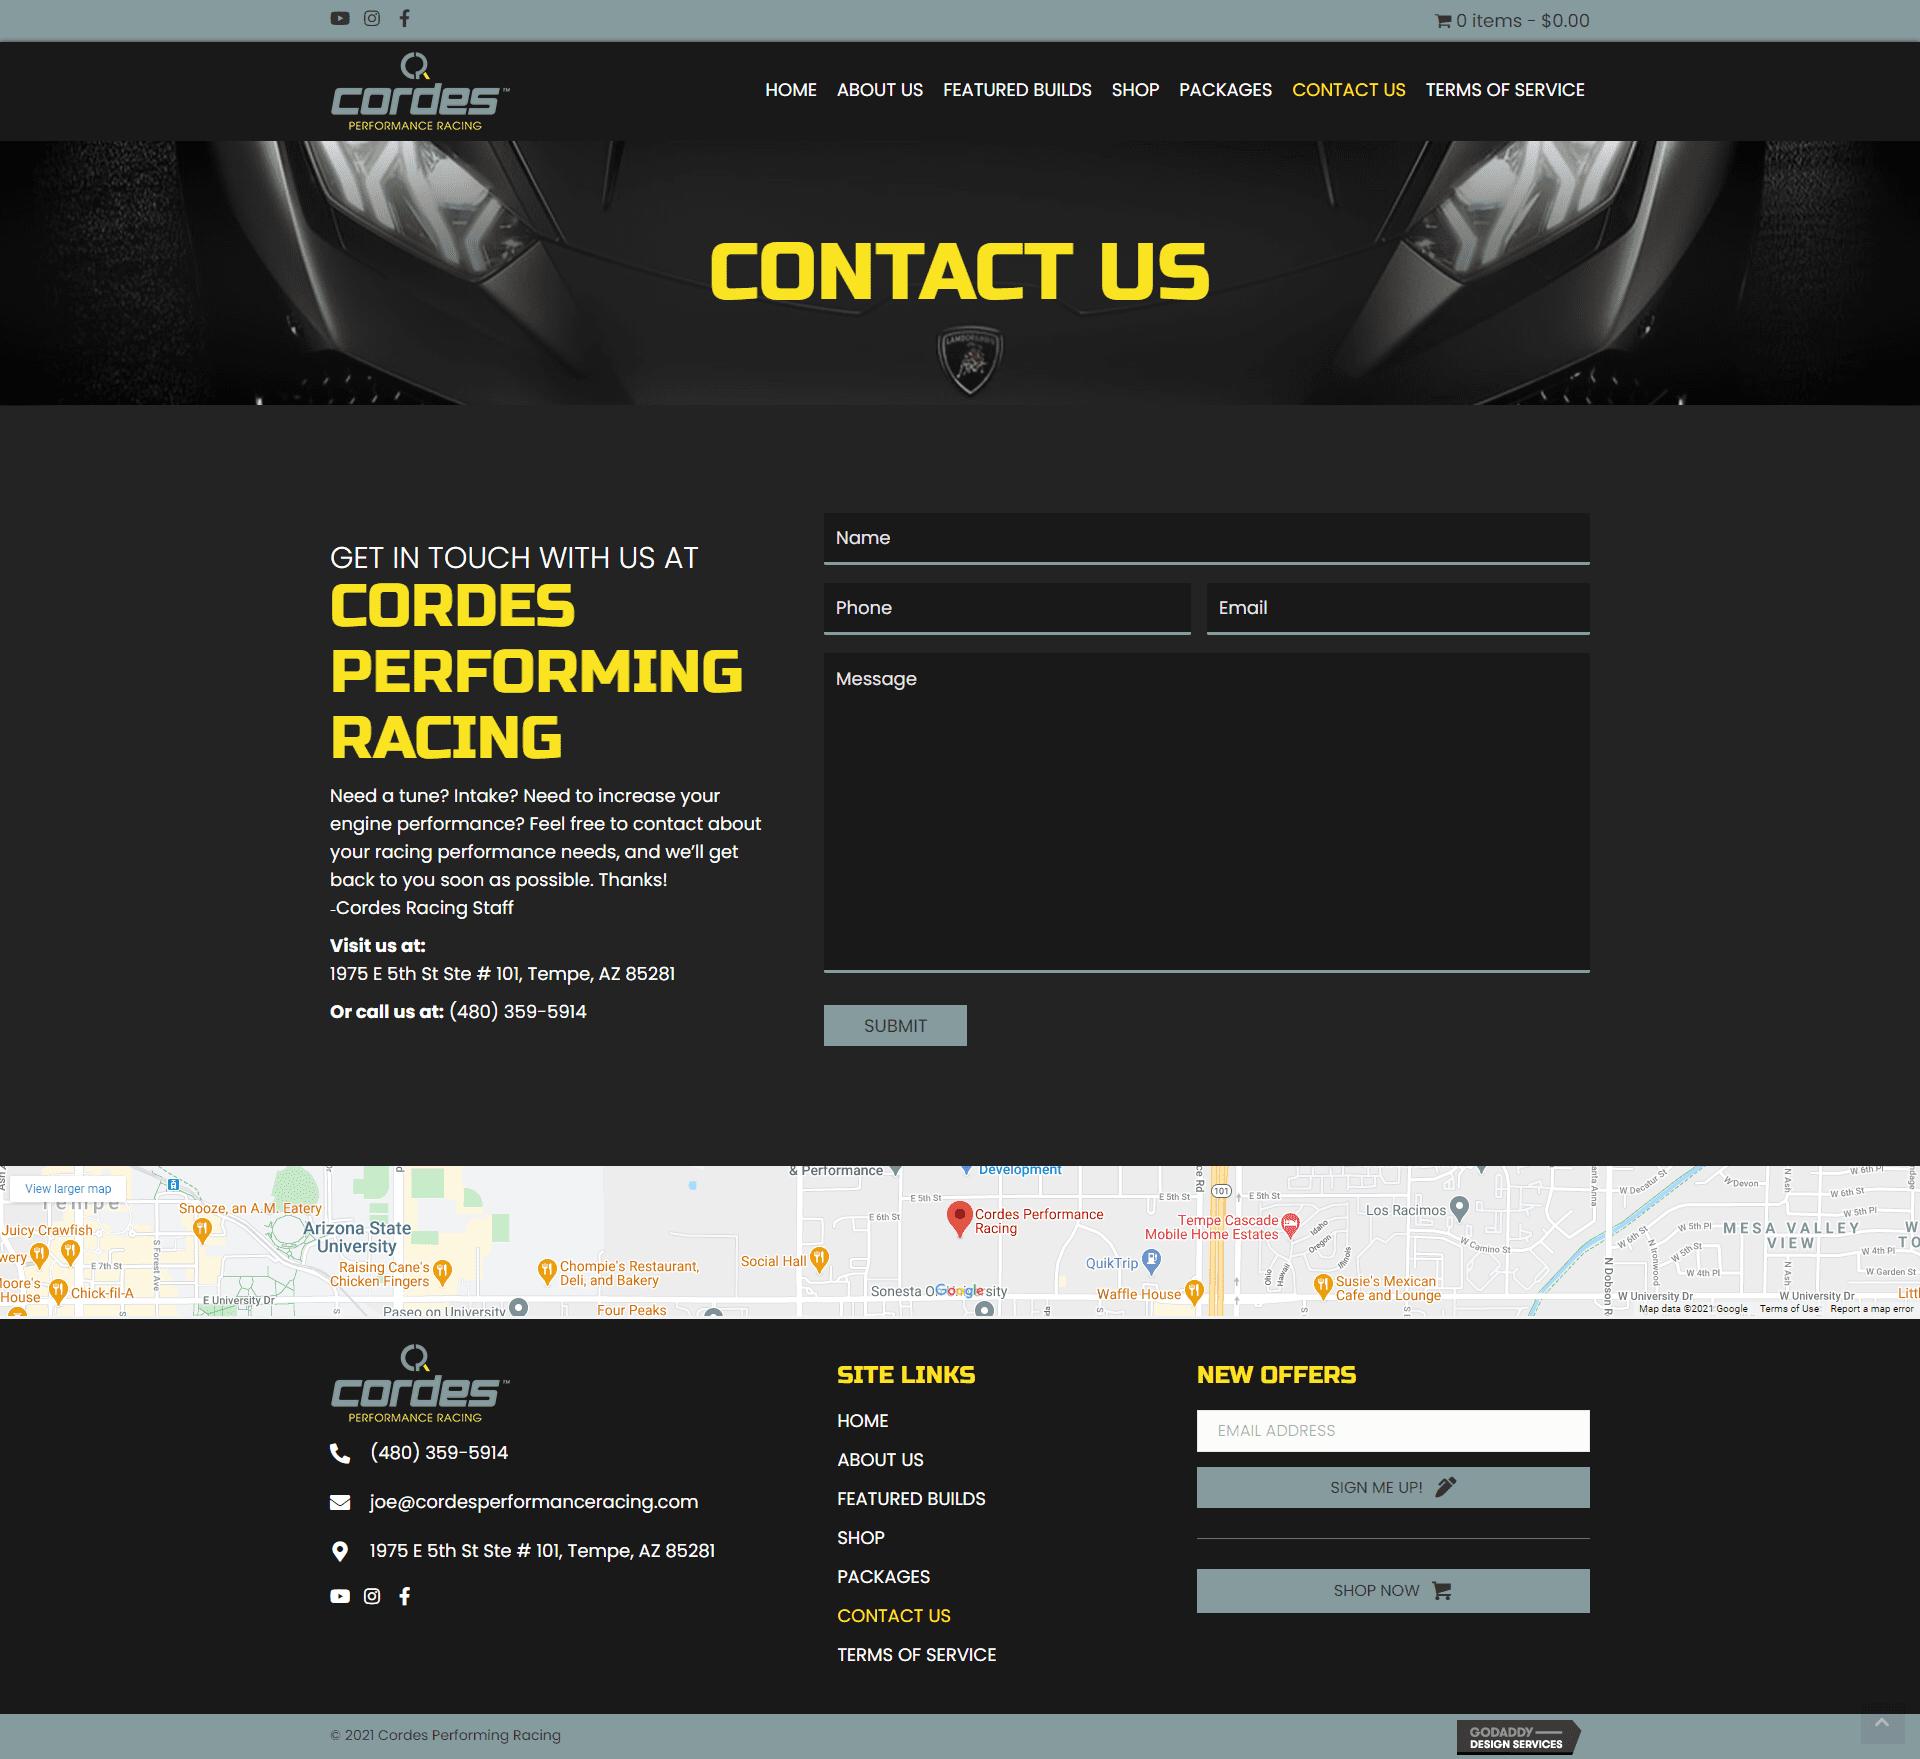 Cordes Performing Racing Contact